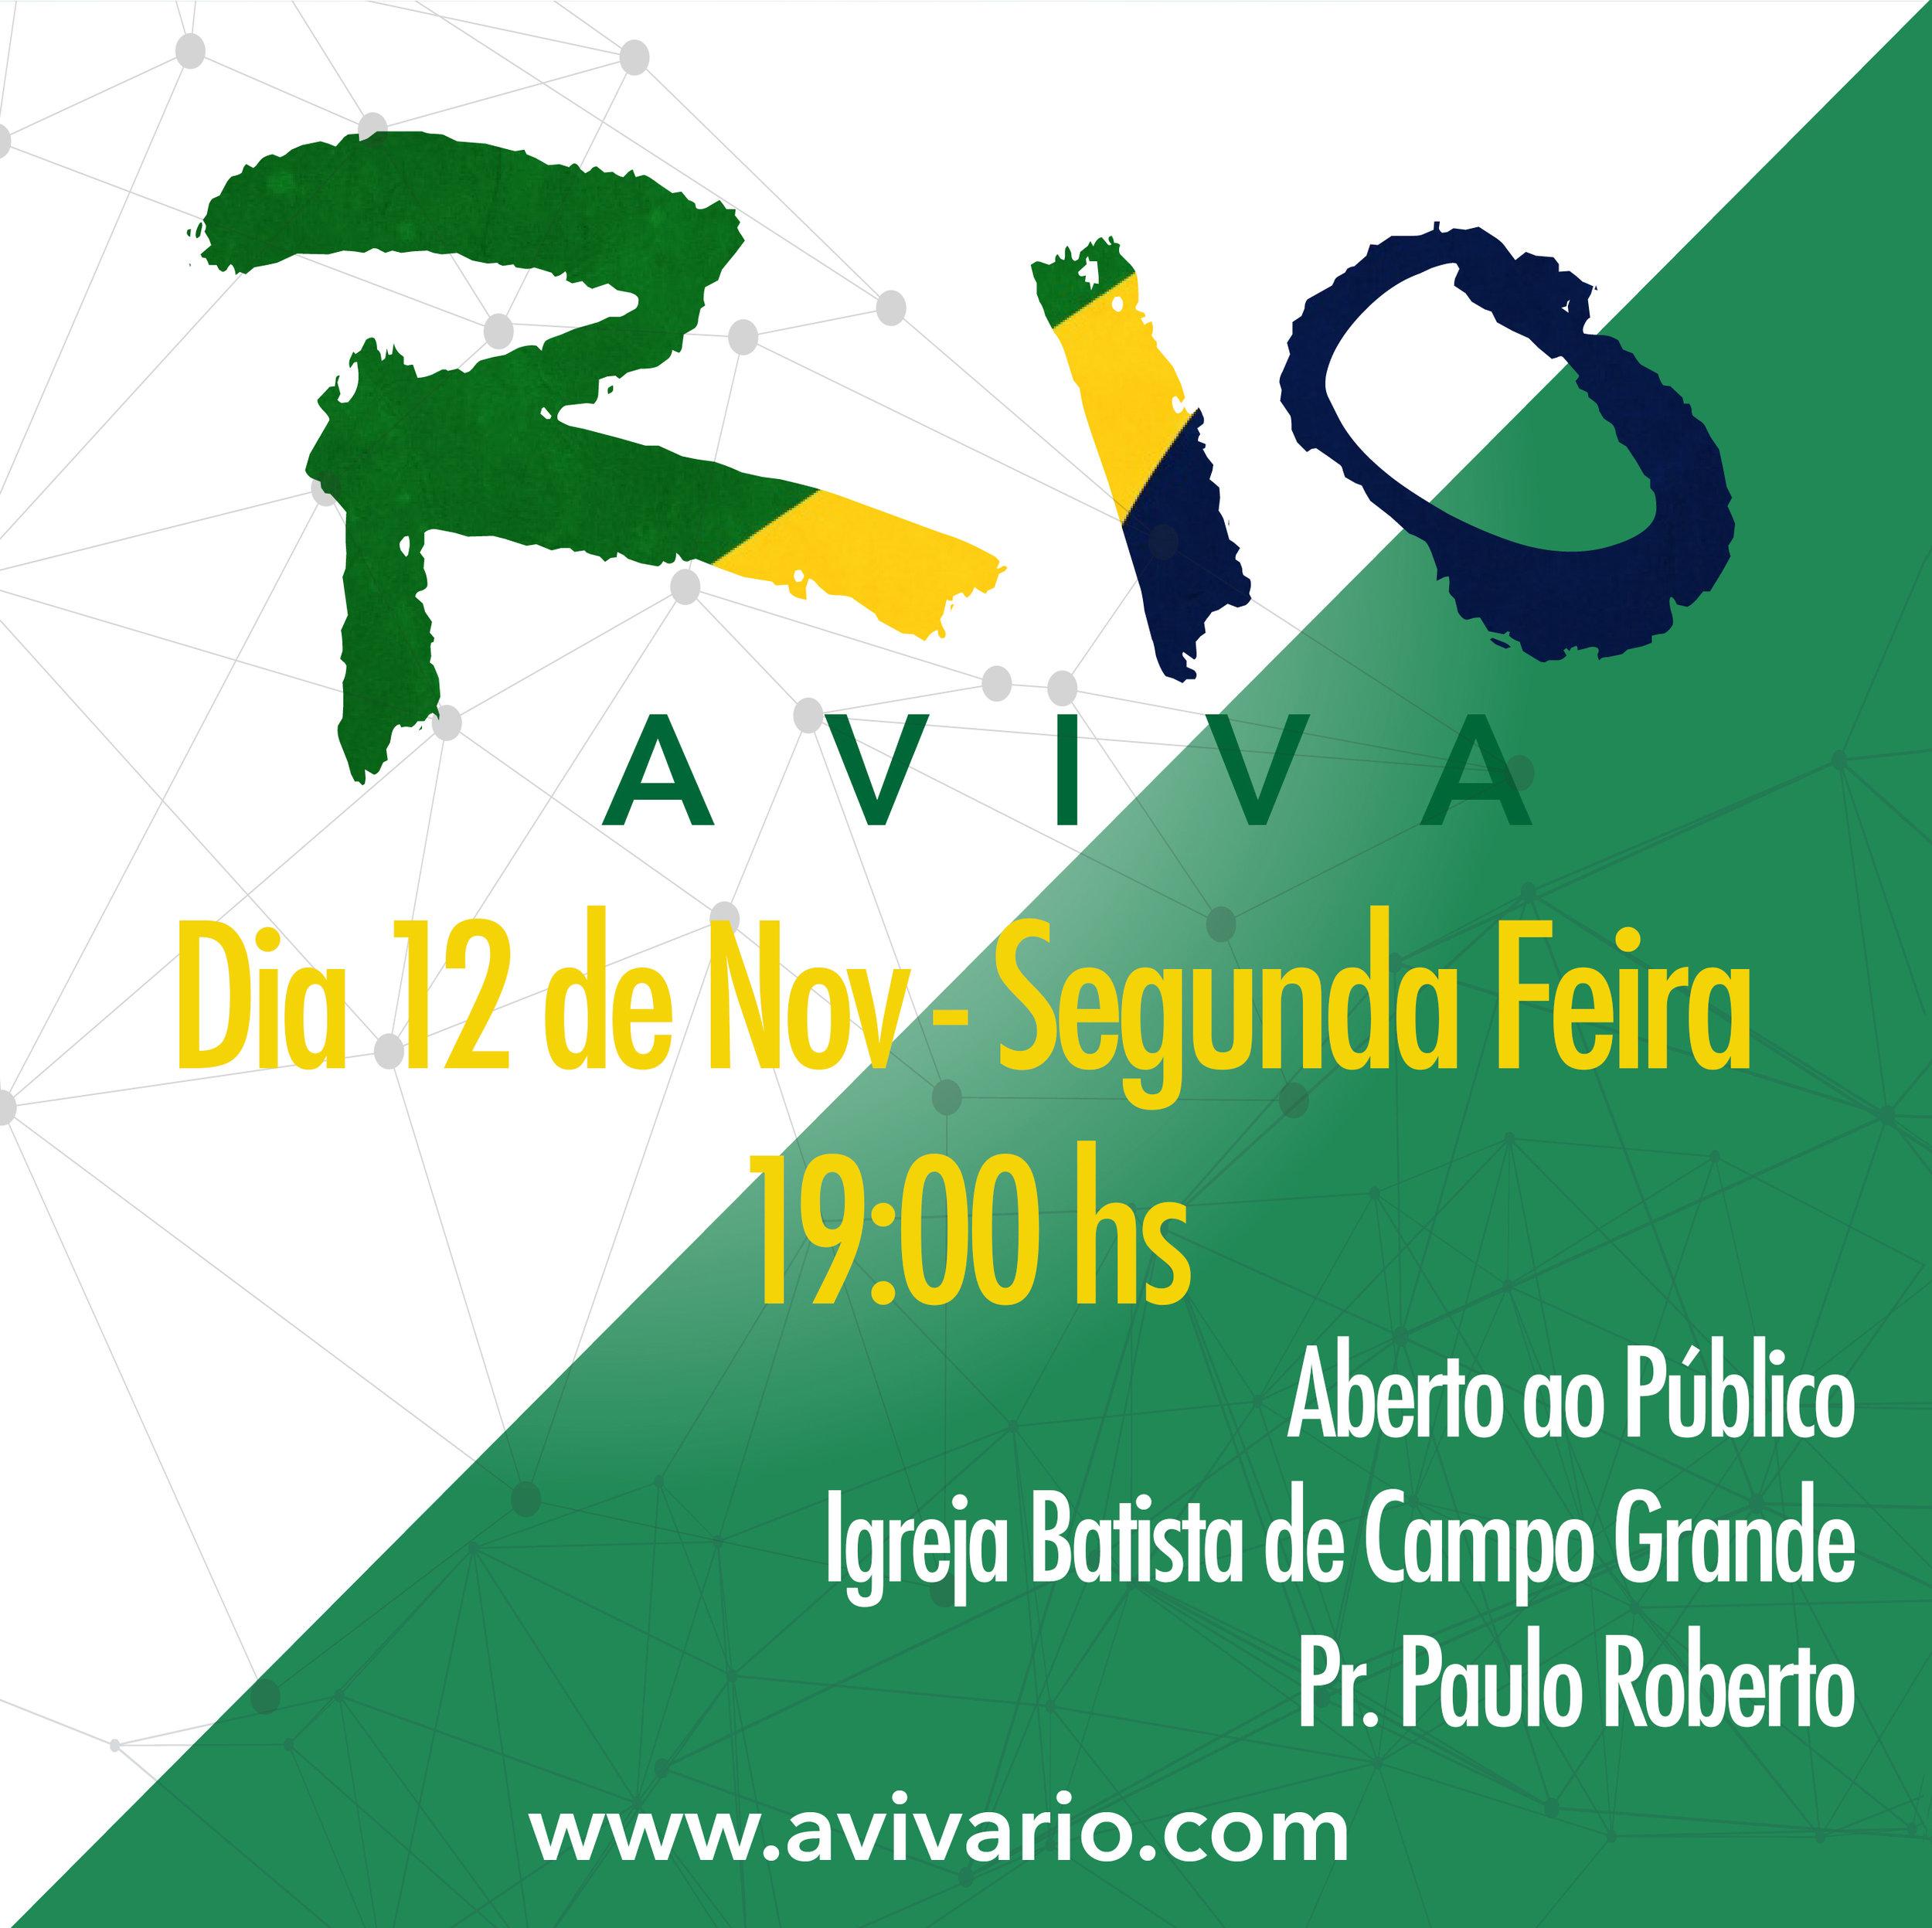 RioRevived-Monday-PM-IG-Portuguese-2.jpg